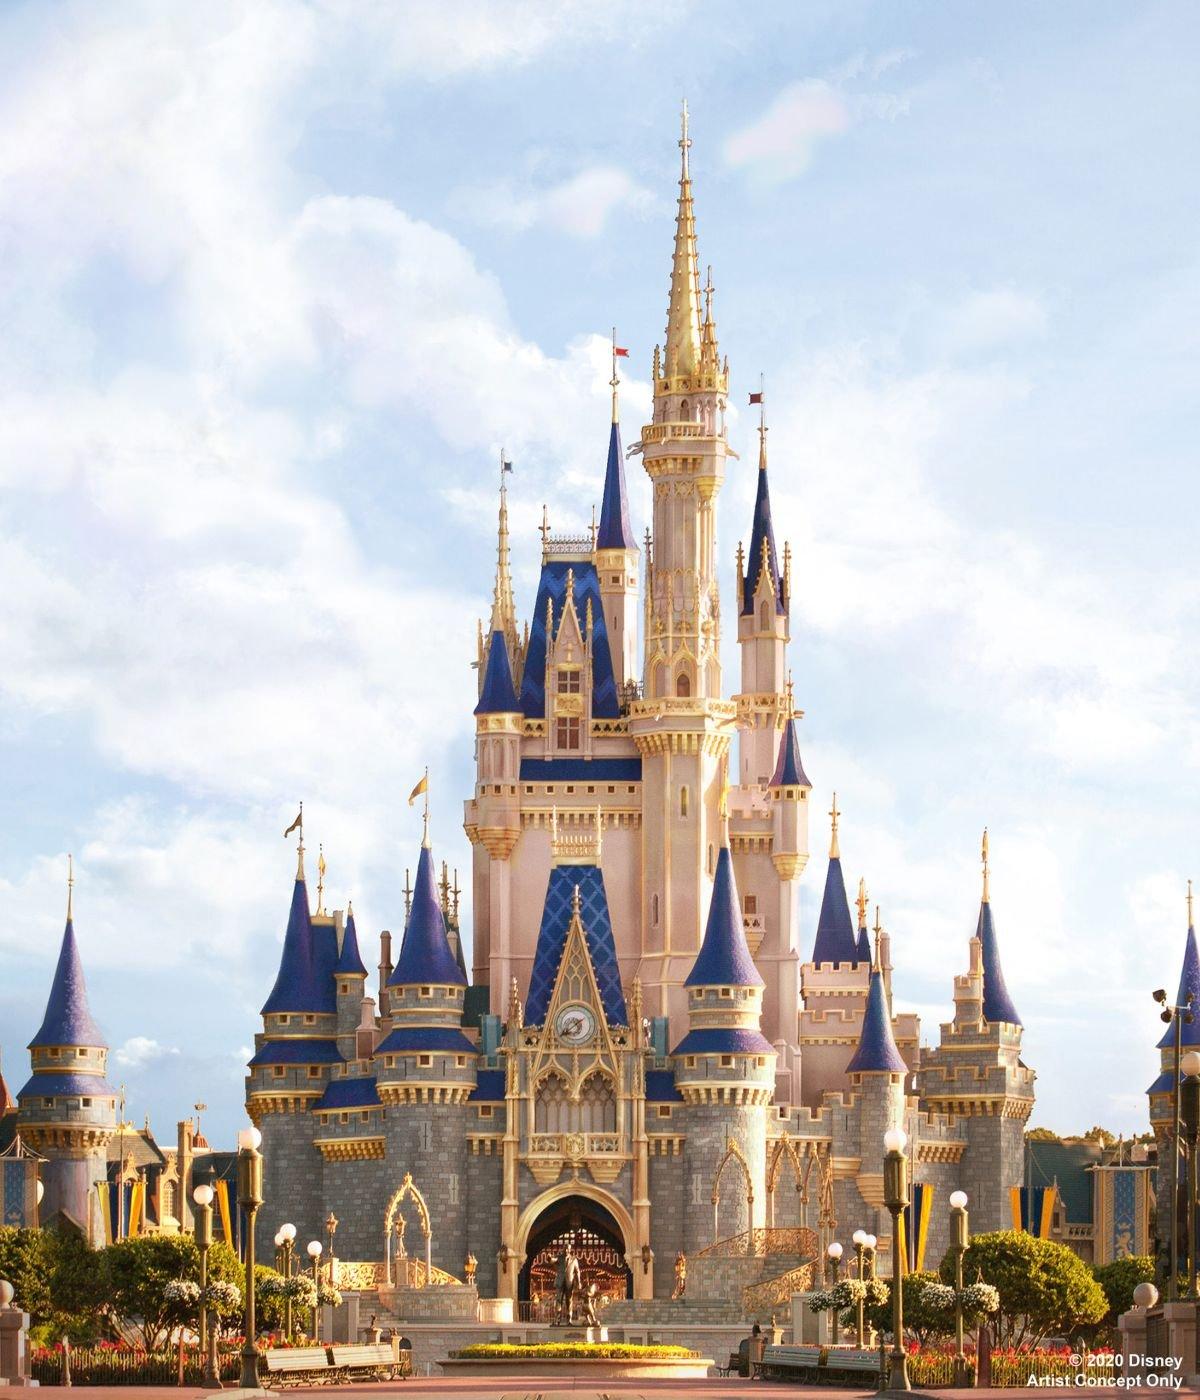 Cinderella Castle Concept art